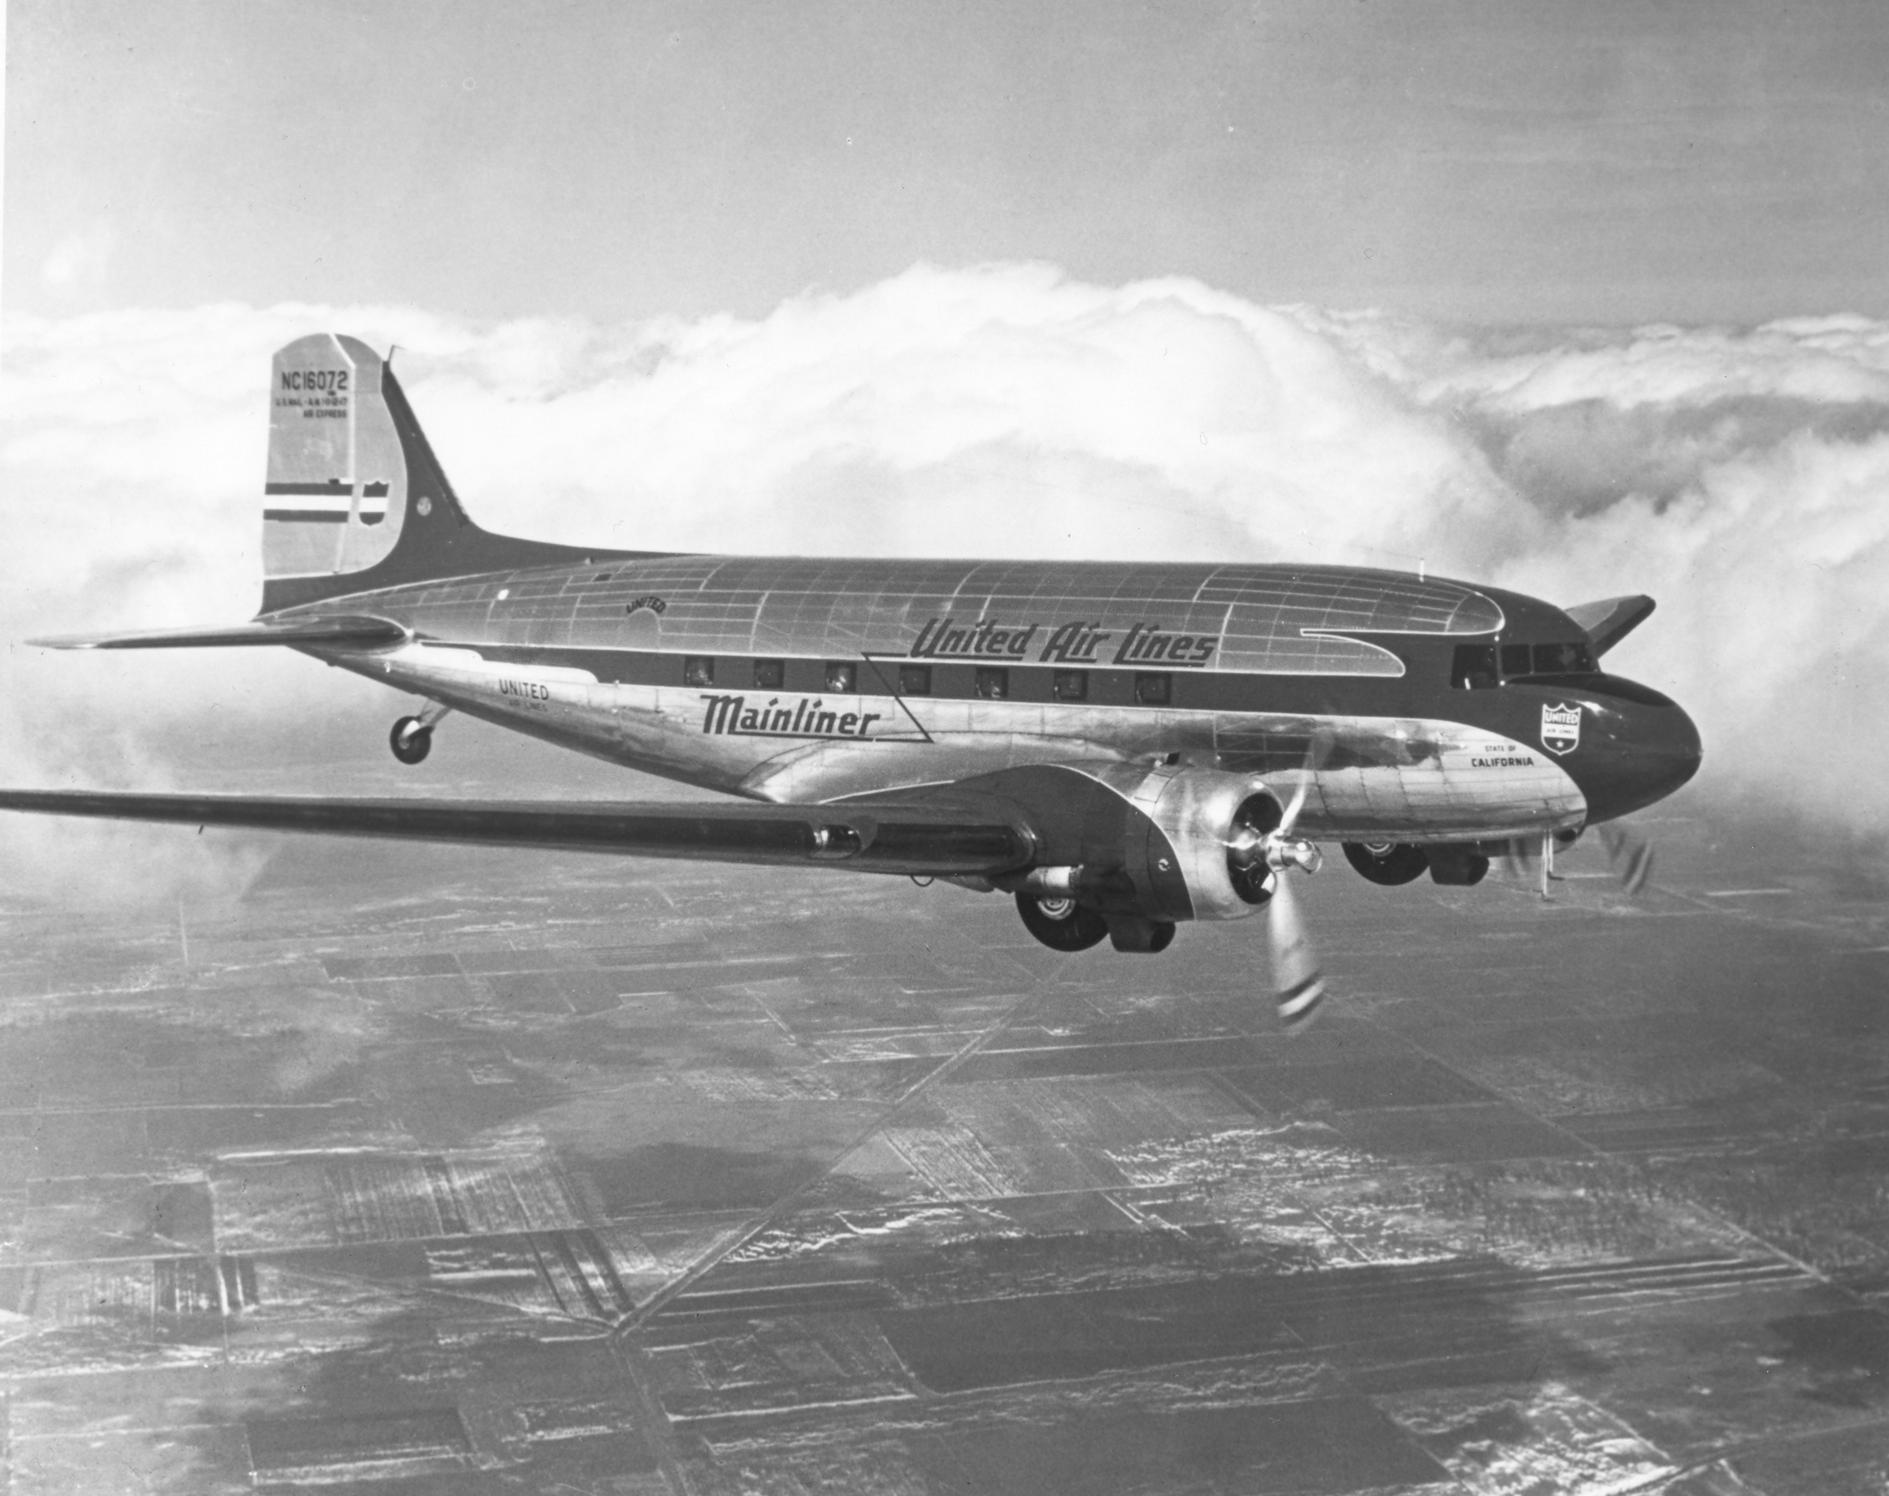 Douglas DC-3 wallpapers HD quality